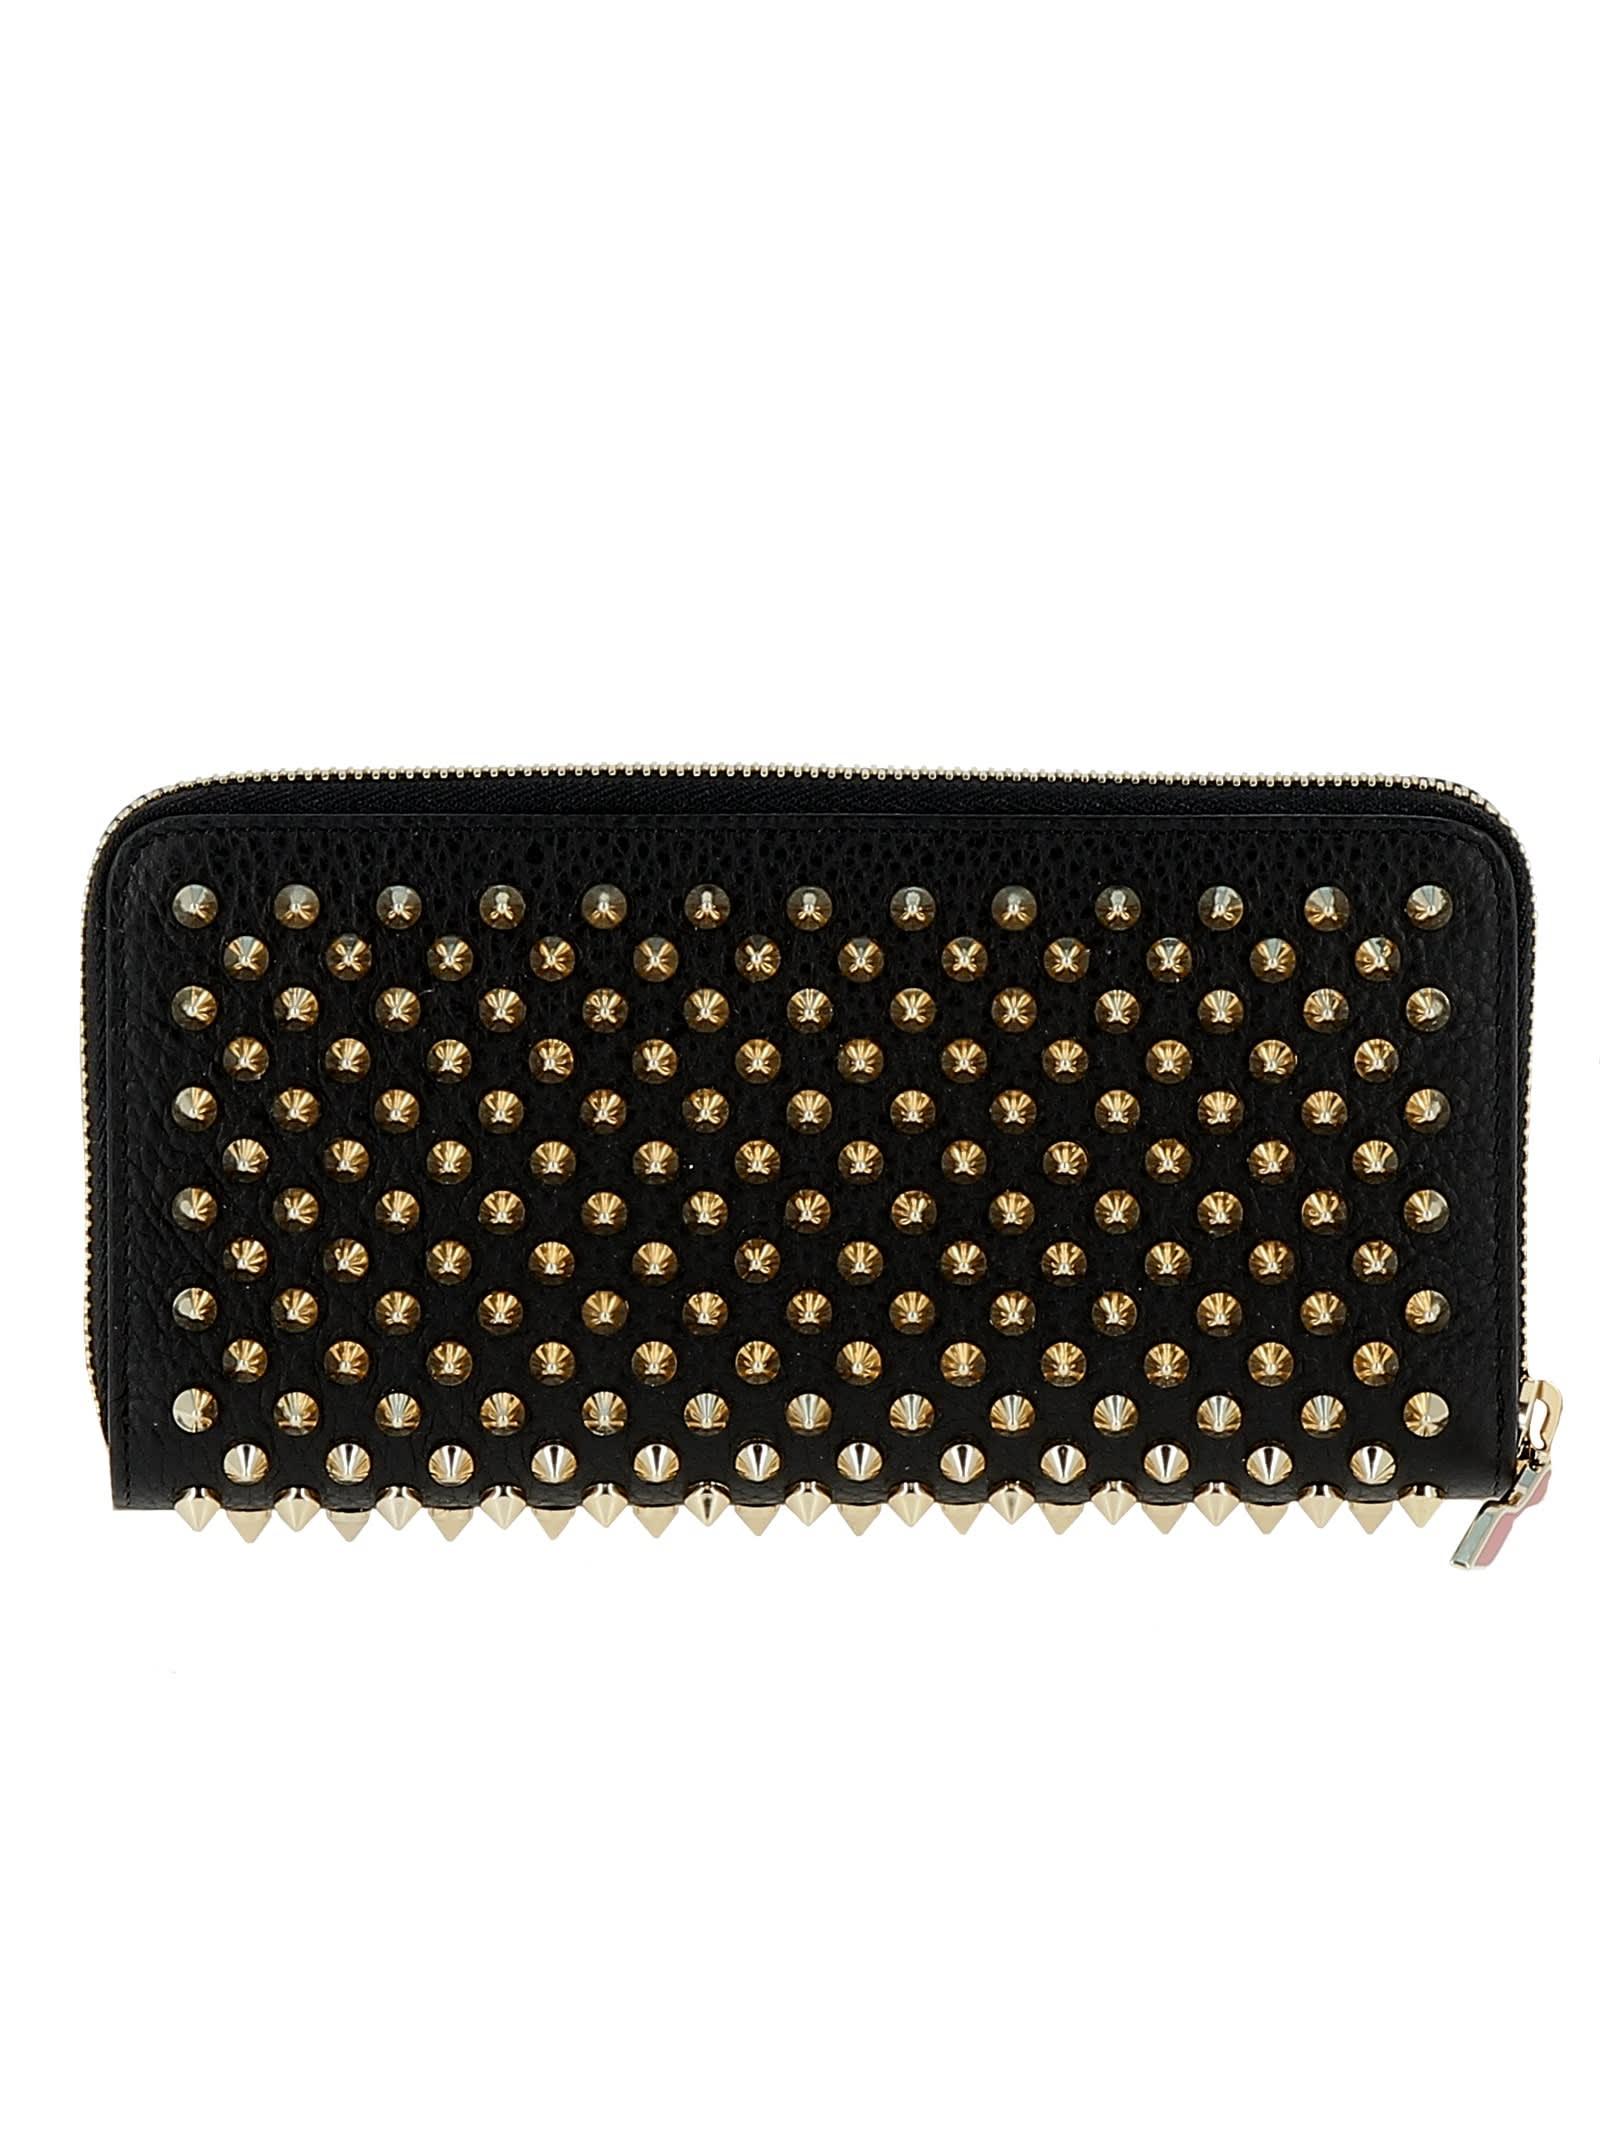 best website 18ab0 4fde5 Christian Louboutin Black/gold Leather Wallet